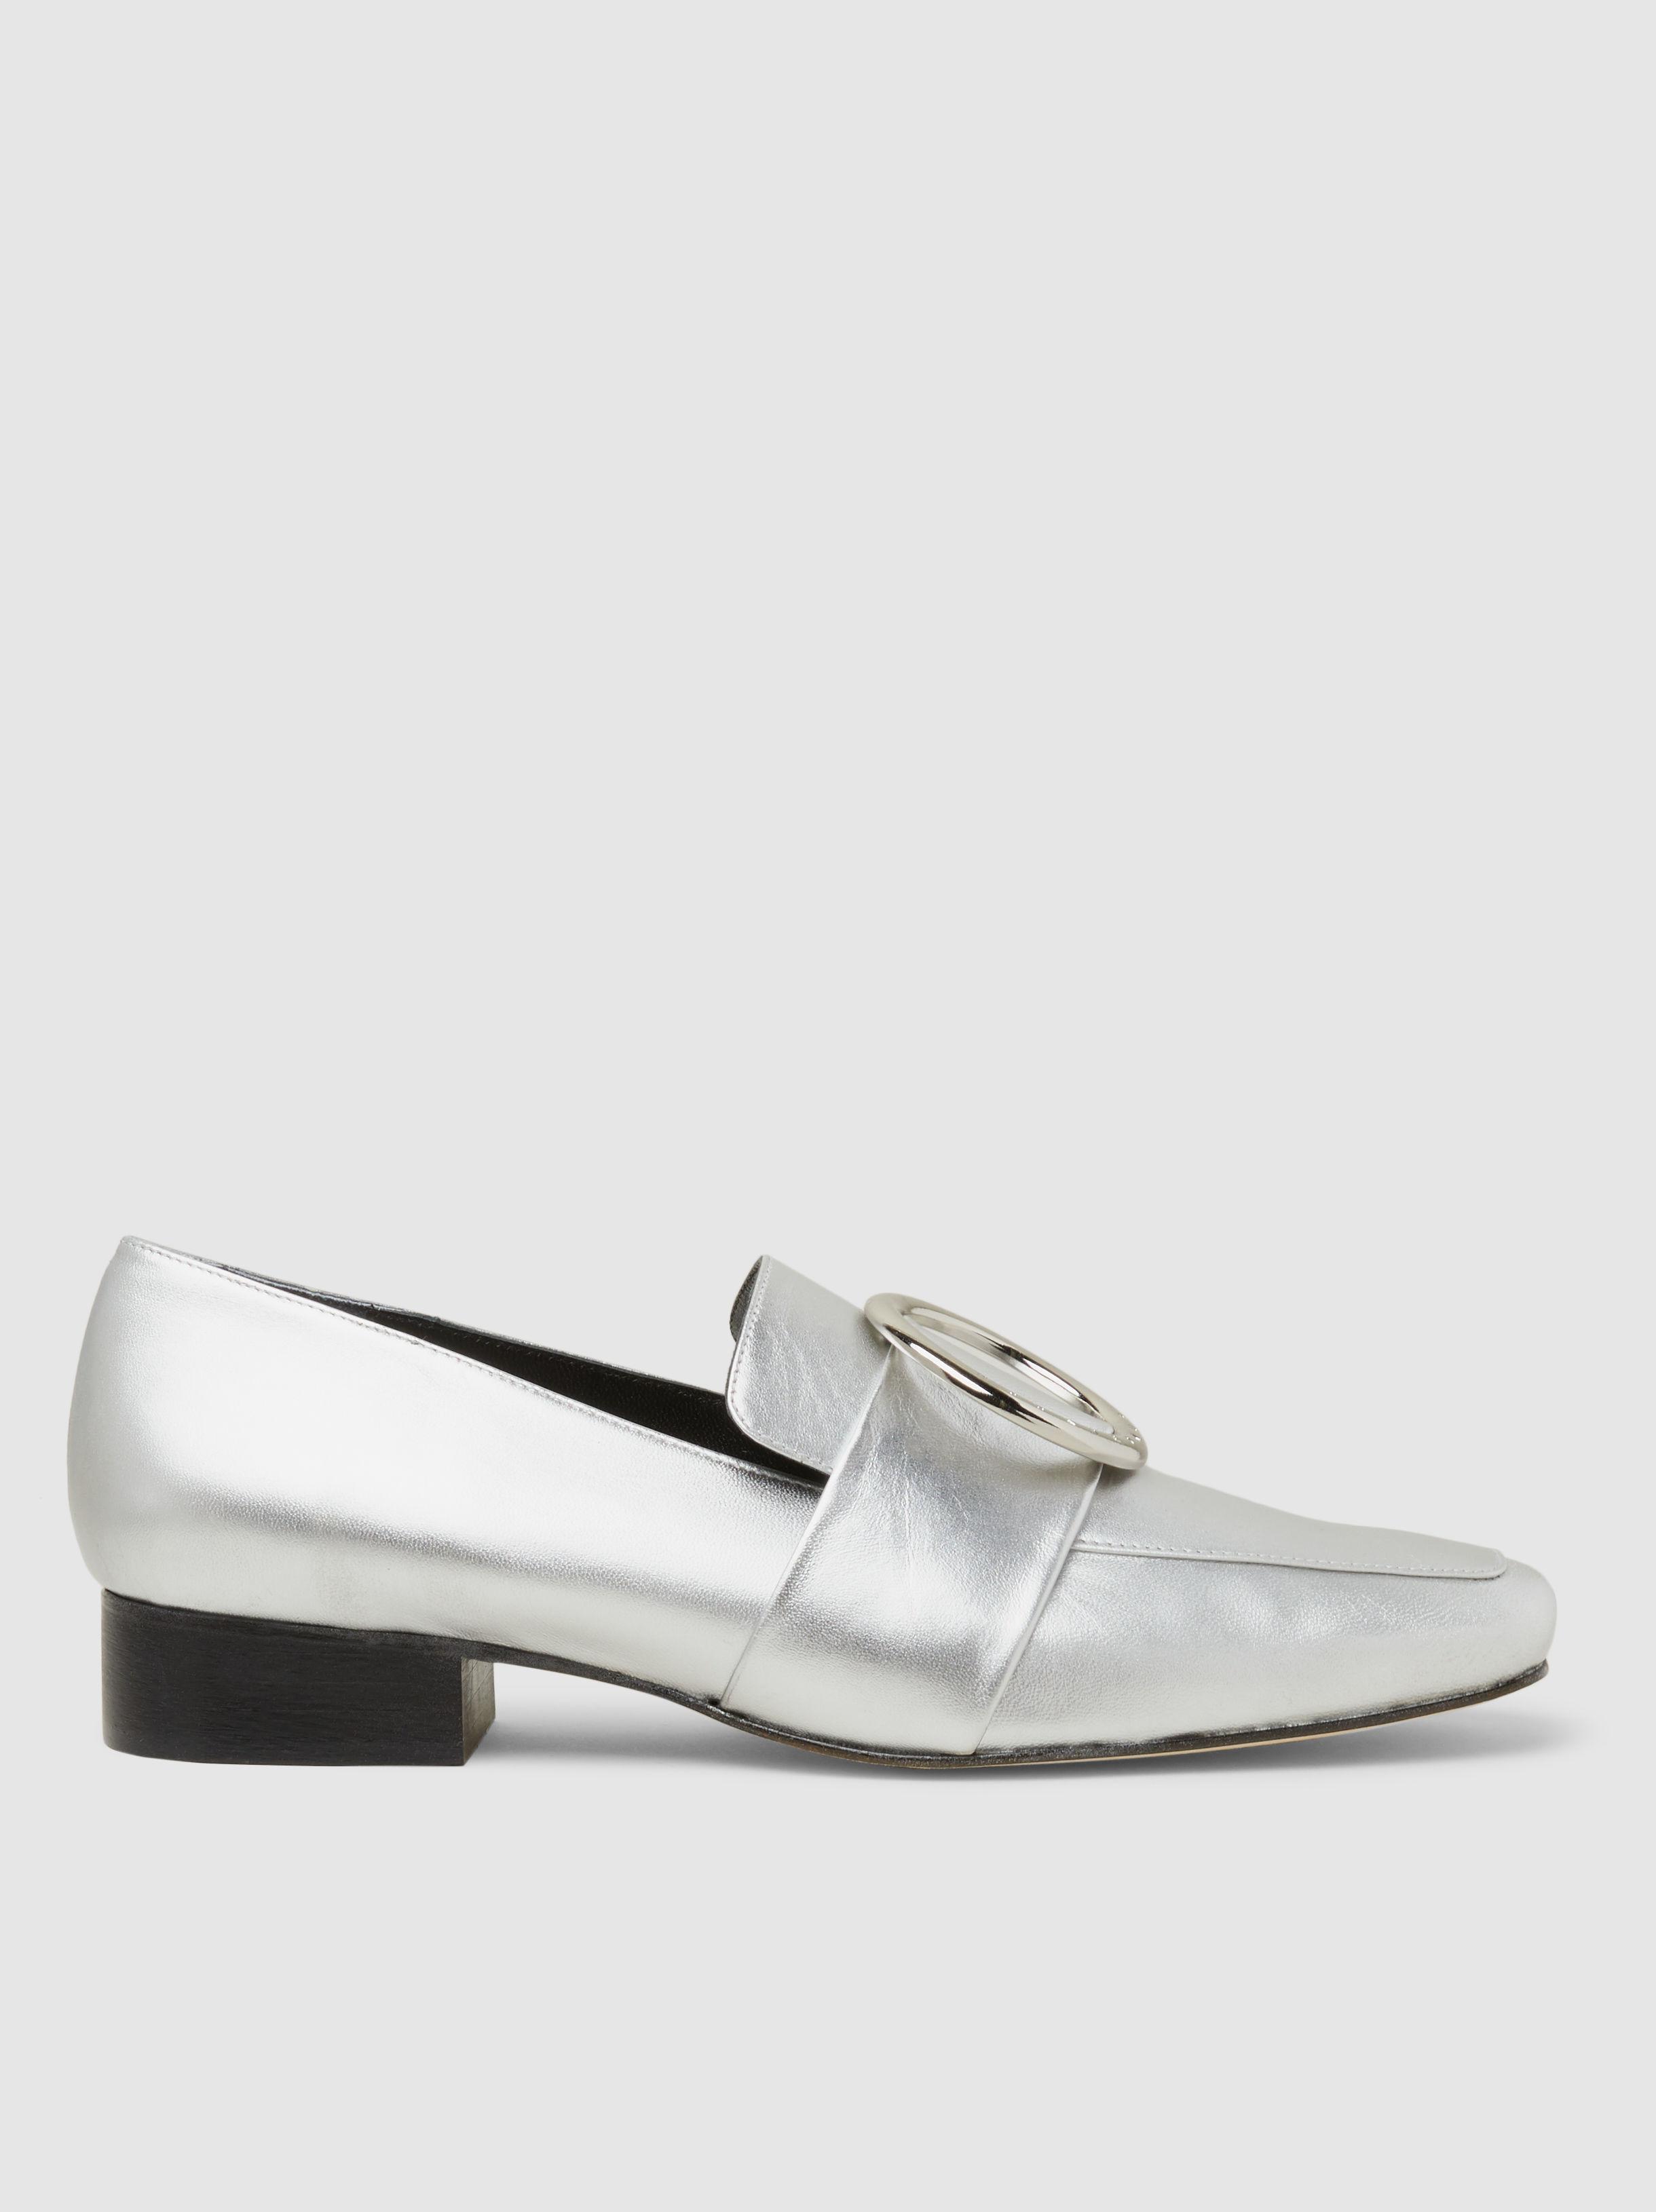 Harput embellished loafers - Metallic DORATEYMUR D0fBy6JEeo